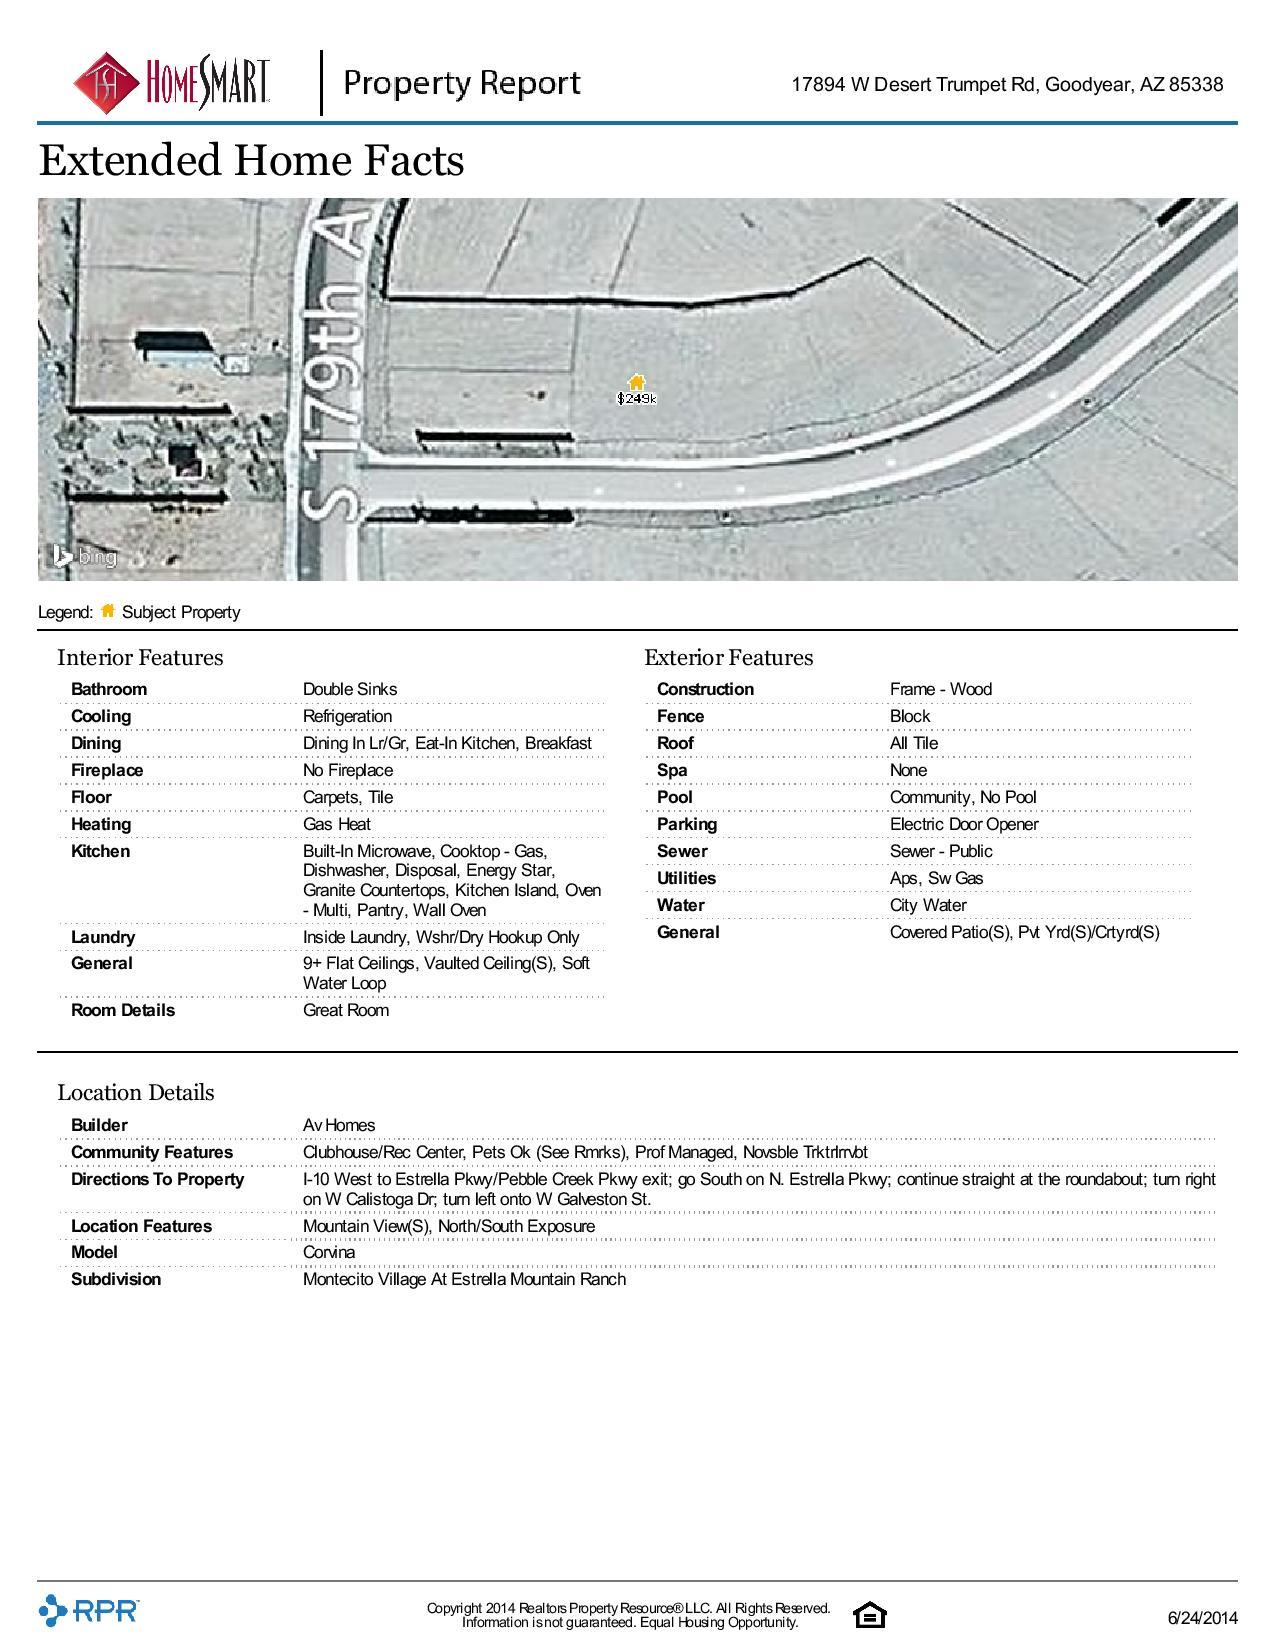 17894-W-Desert-Trumpet-Rd-Goodyear-AZ-85338-page-004